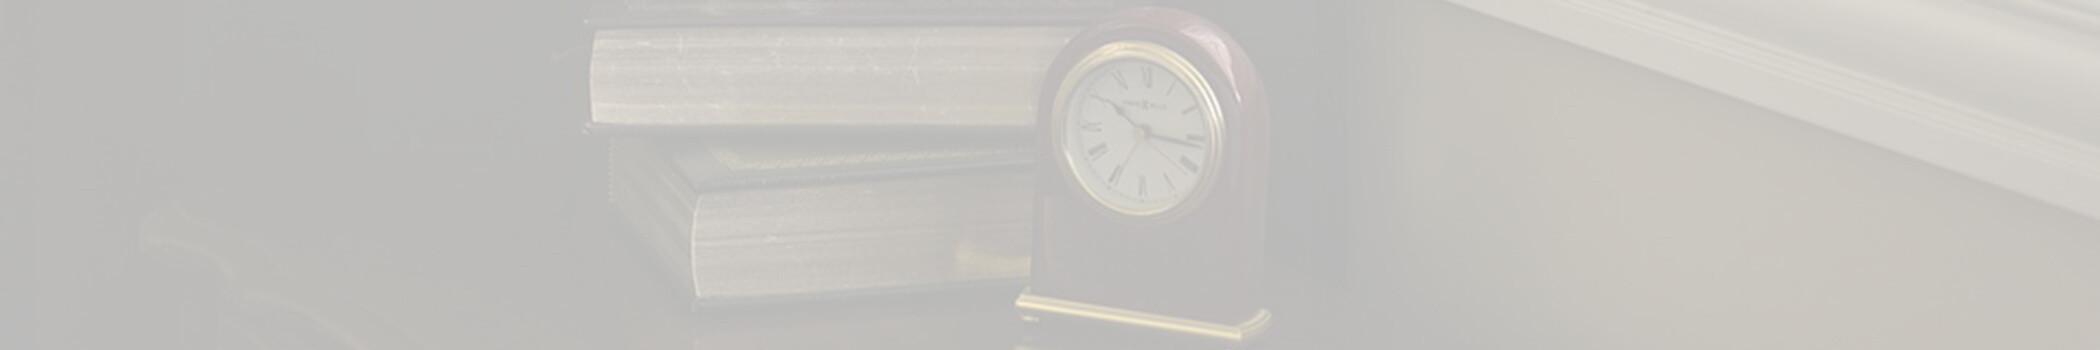 Relojes de pared y sobremesa - Carmena Joyeros